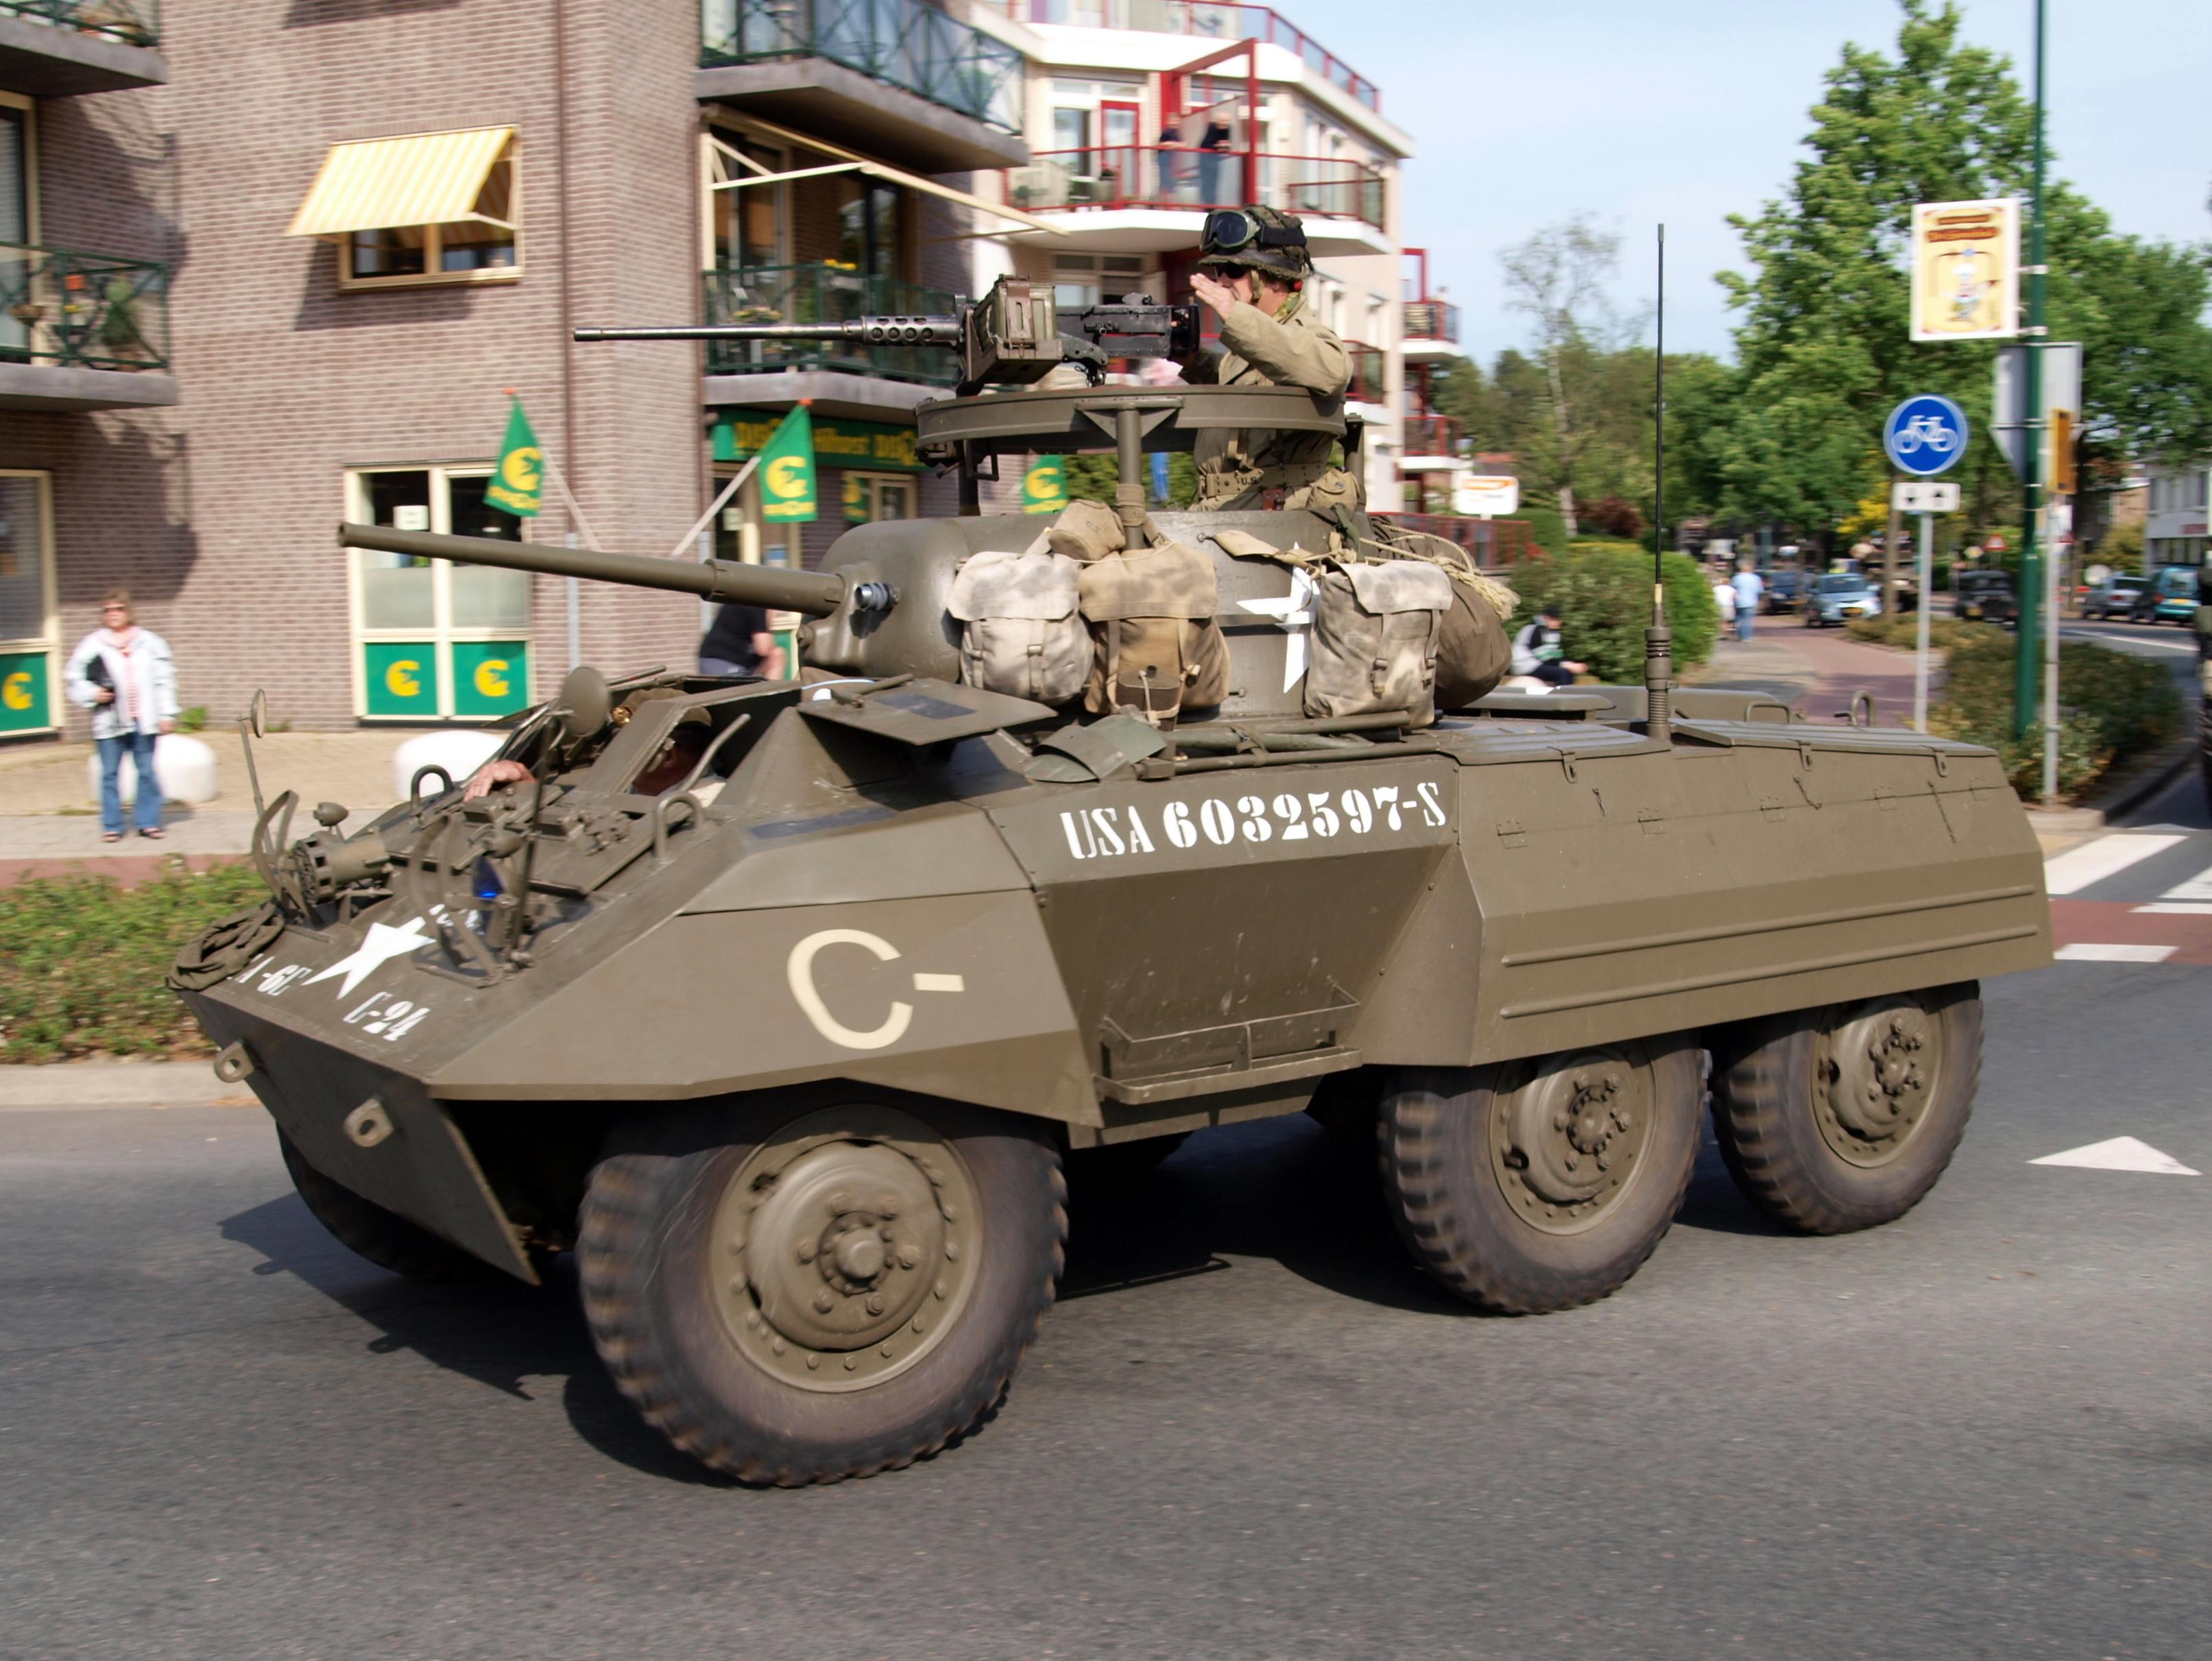 File:M8 Greyhound, C-24, USA 6032597-S, Bridgehead 2011 ...